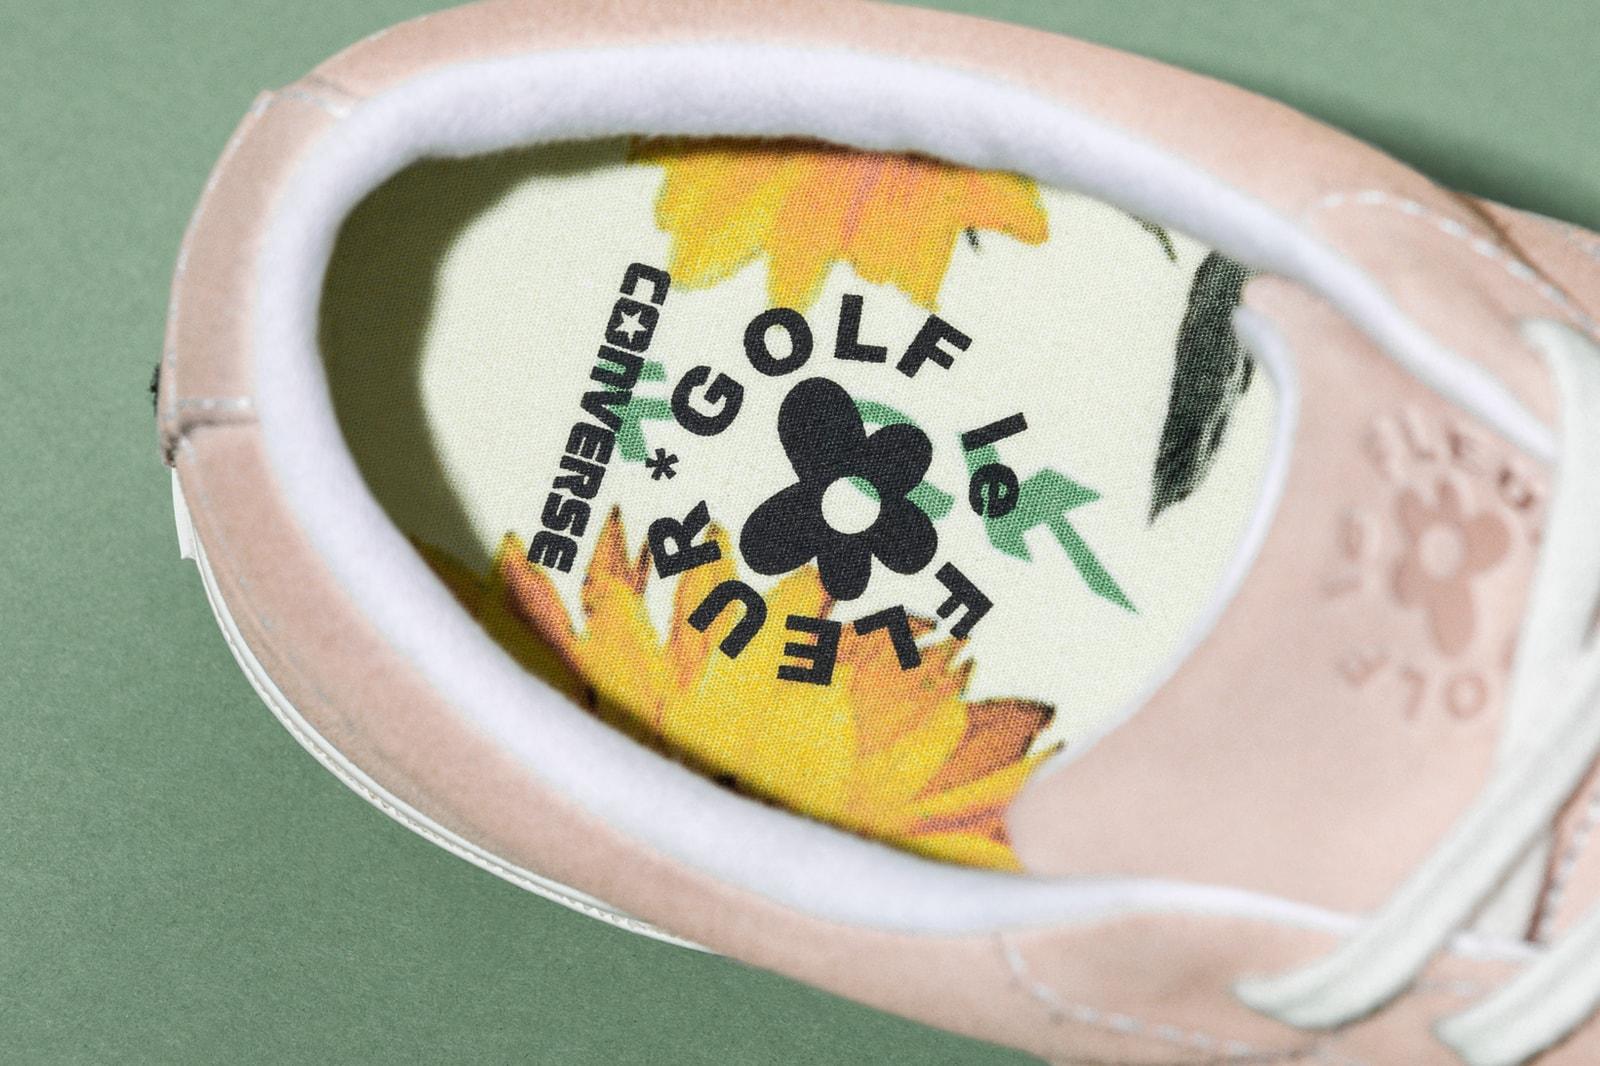 Tyler The Creator Golf Wang Golf le Fleur Converse One Star Release Date Info